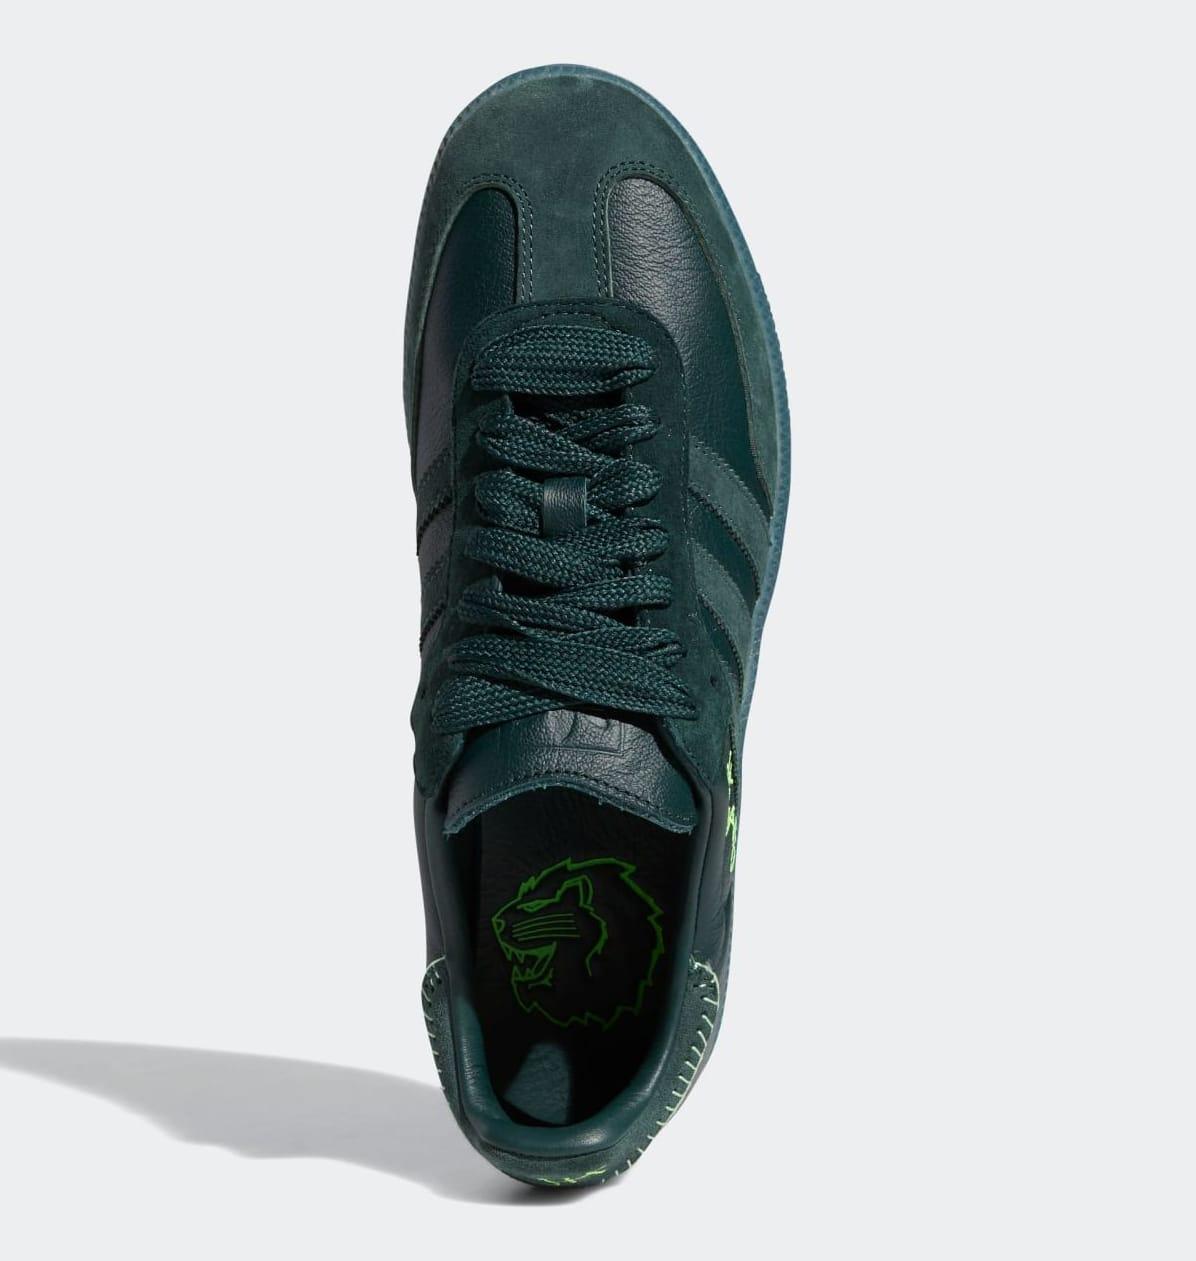 Jonah Hill x Adidas Samba 'Green' FW7458 Top